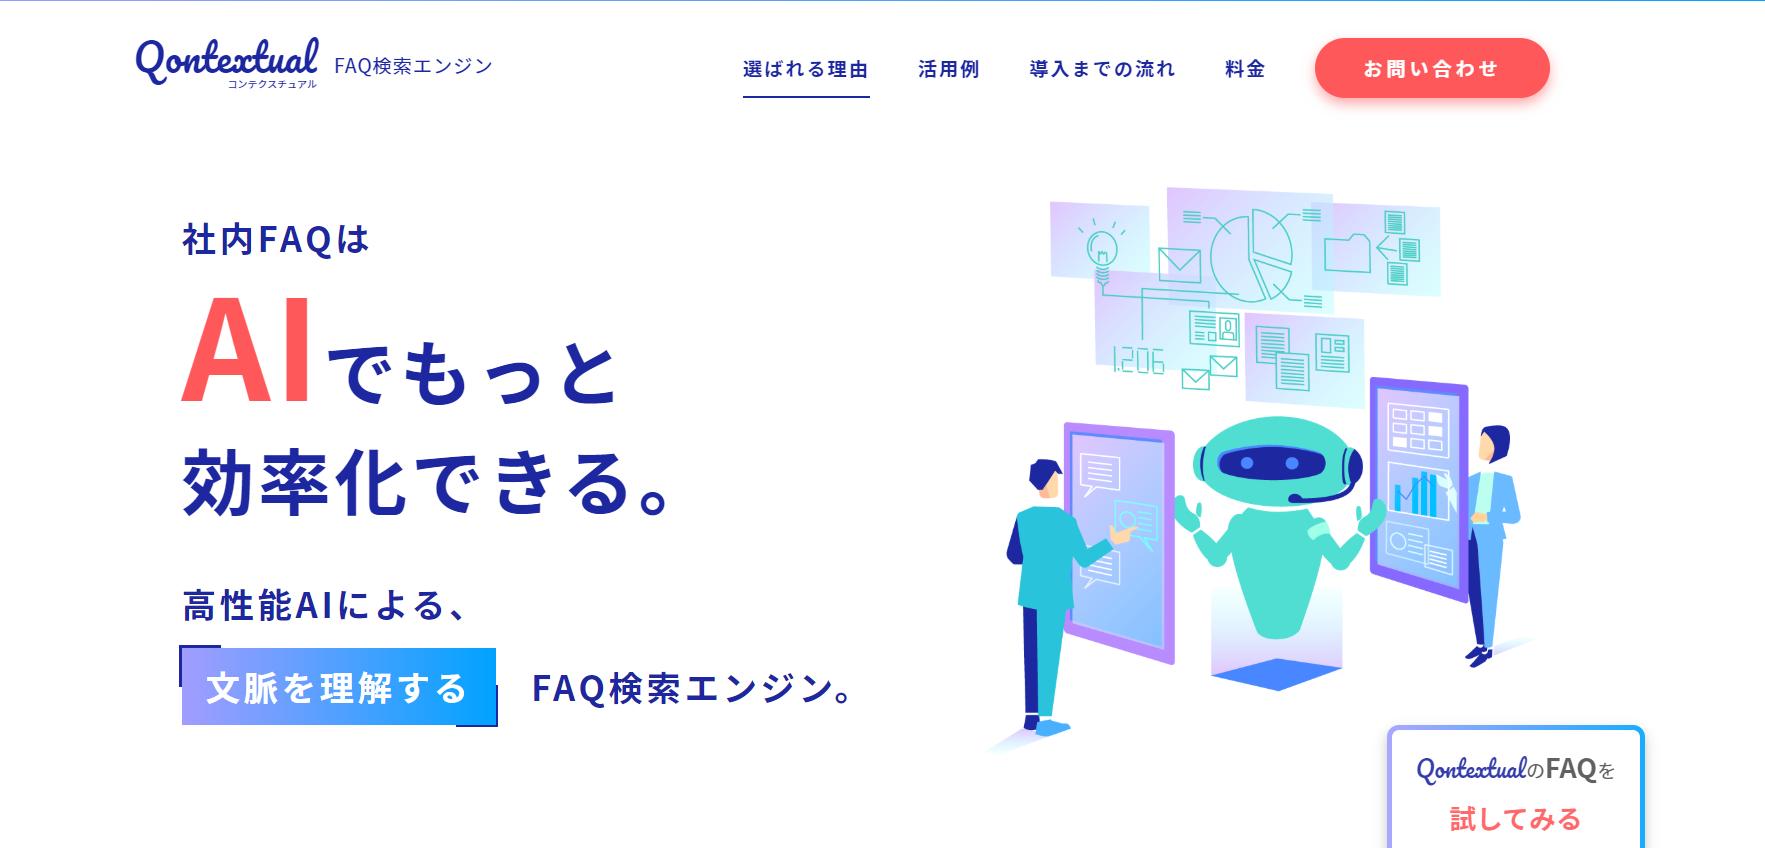 FAQツール7「Qontextual」